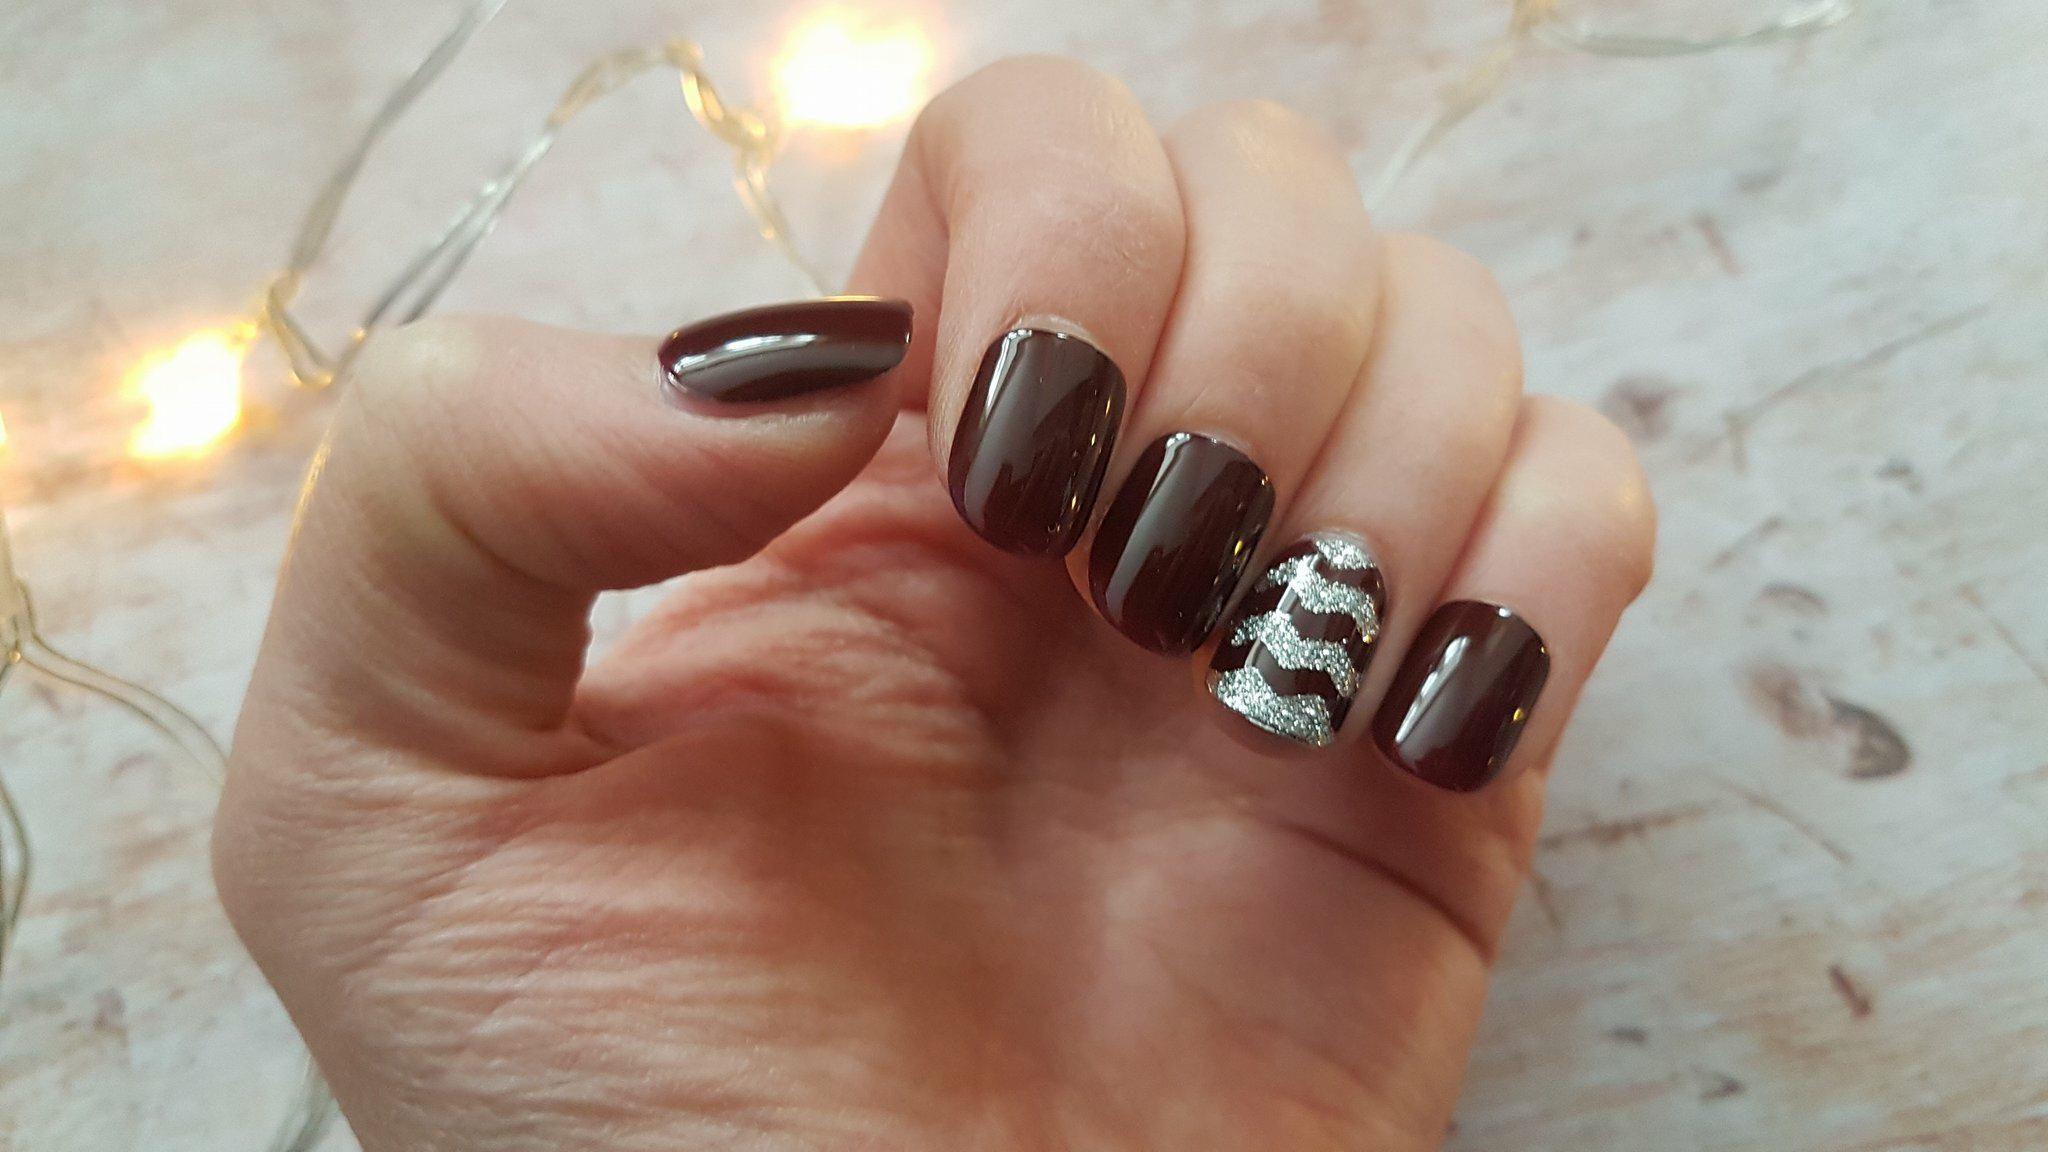 Kiss Nails imPress stick on nails